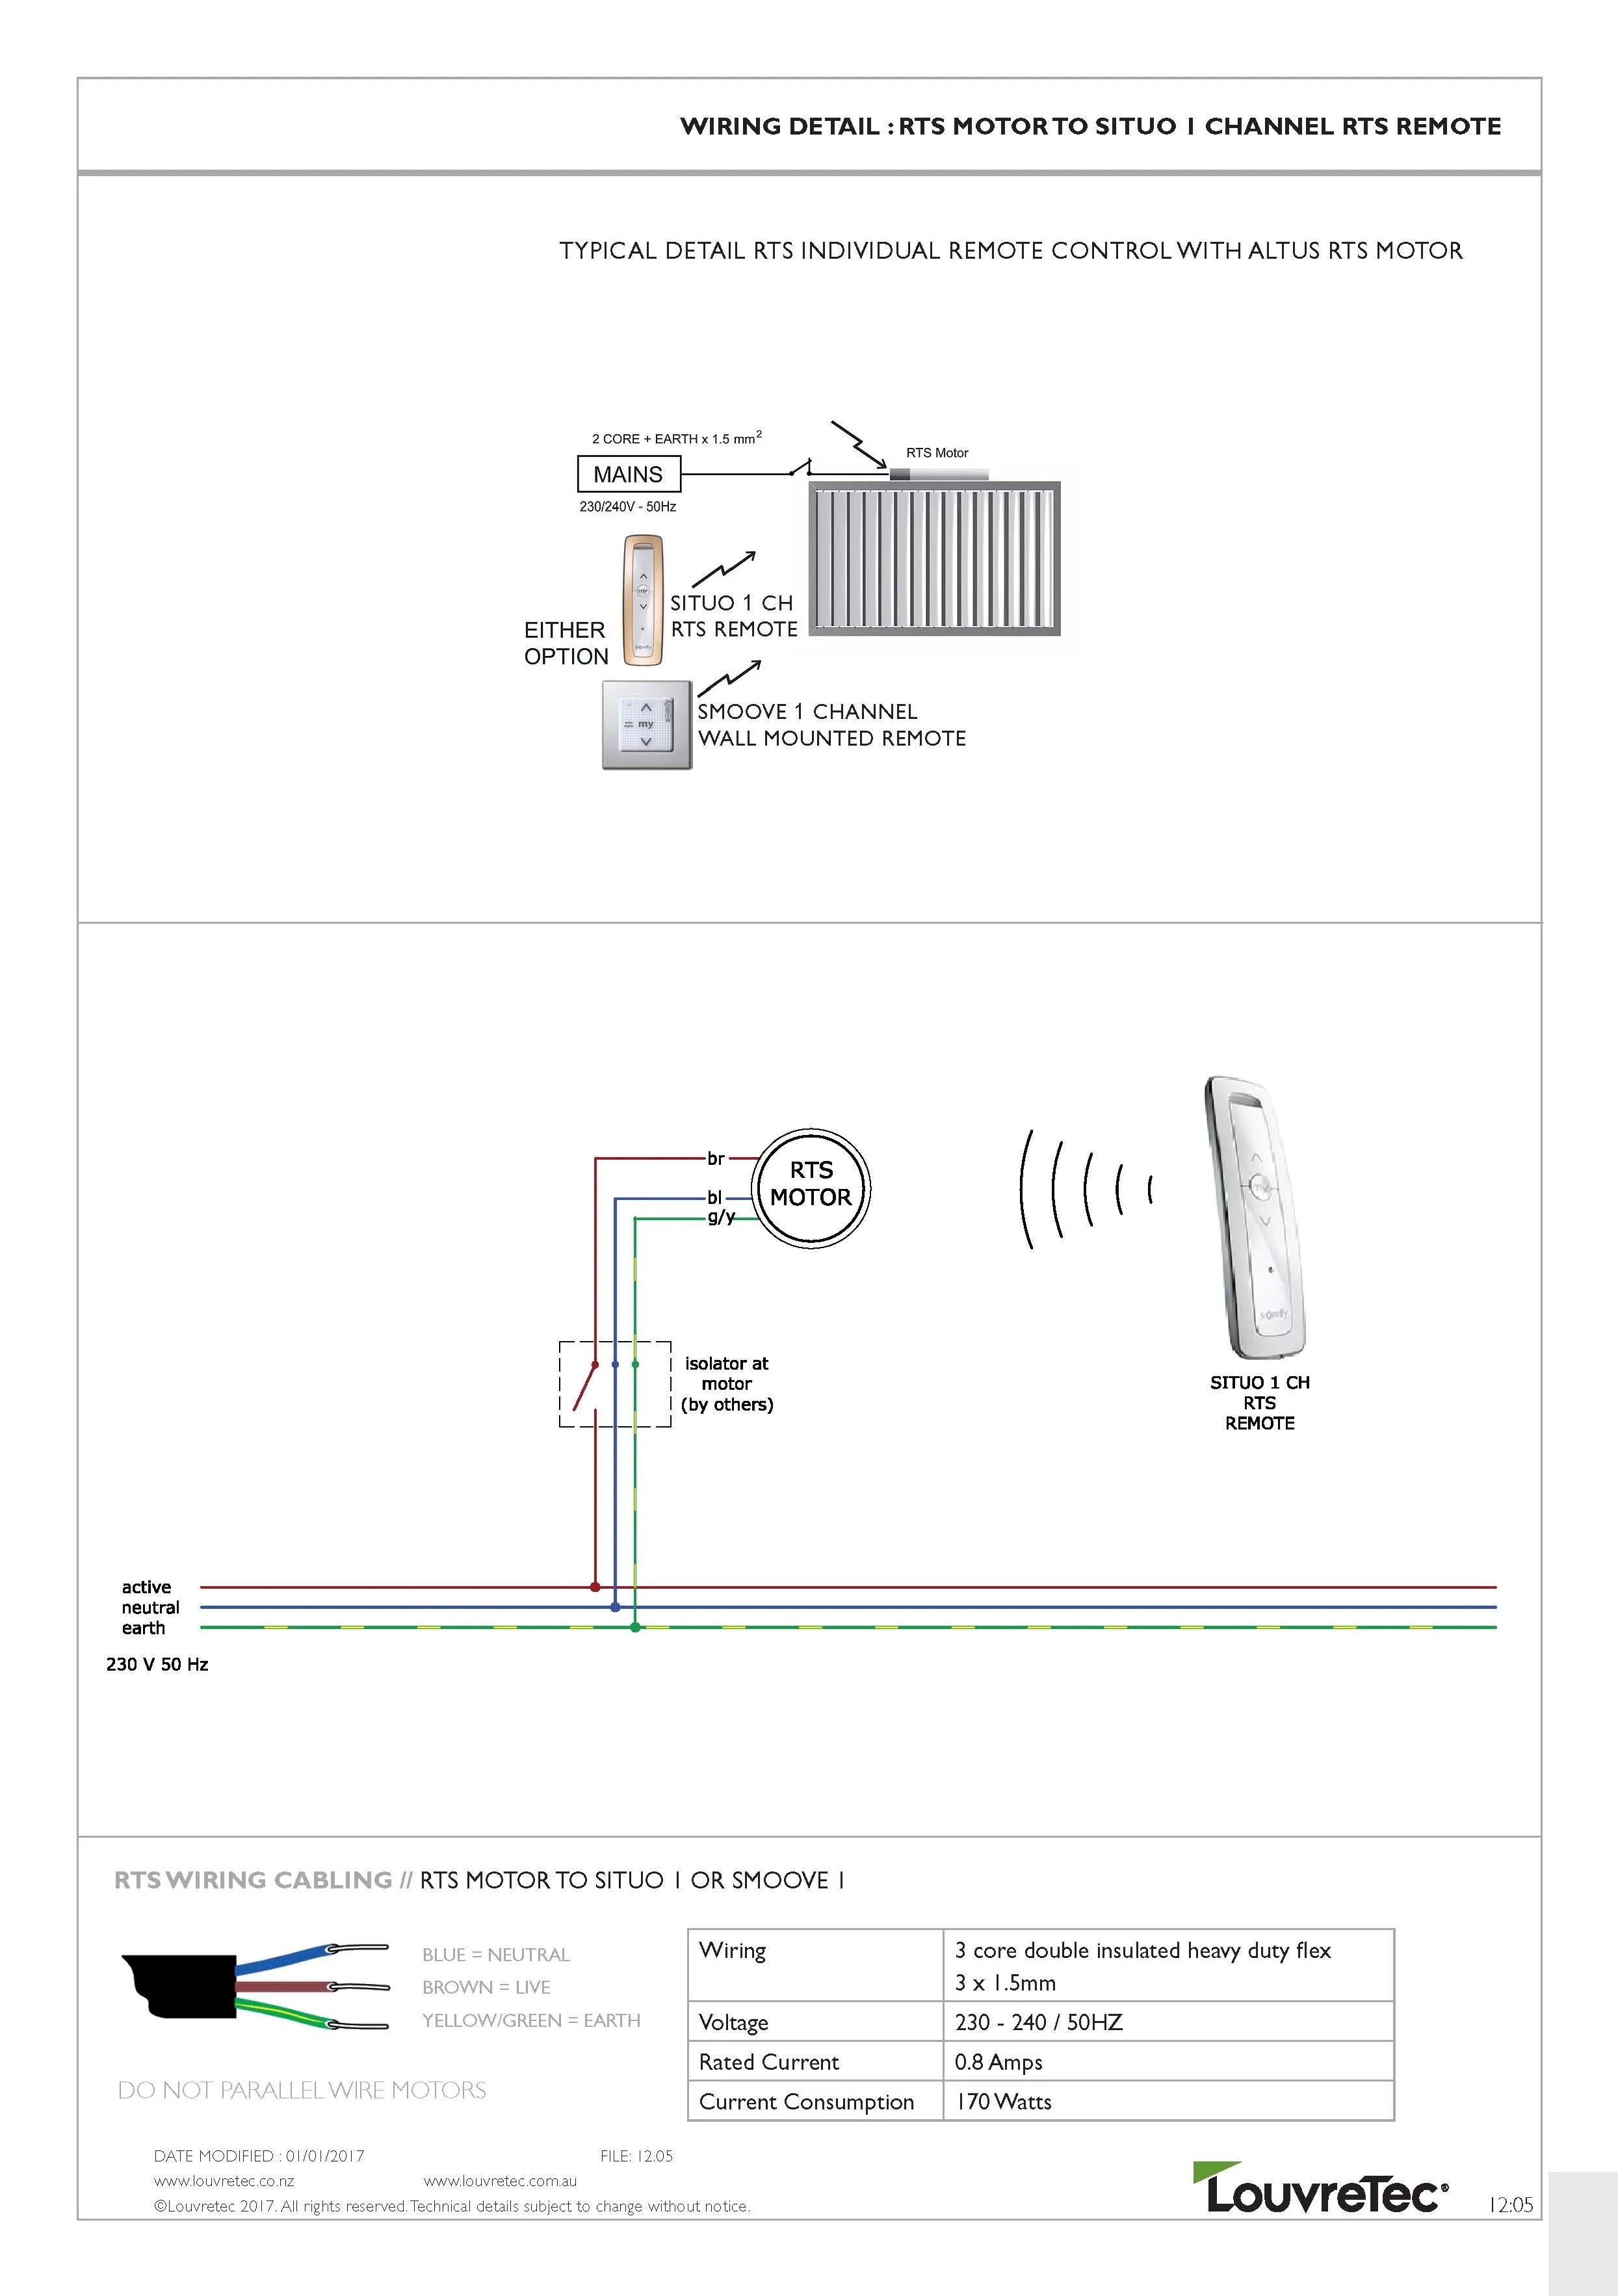 medium resolution of rts motor wiring diagram wiring diagrams somfy replacement motor somfy wiring diagram dpdt